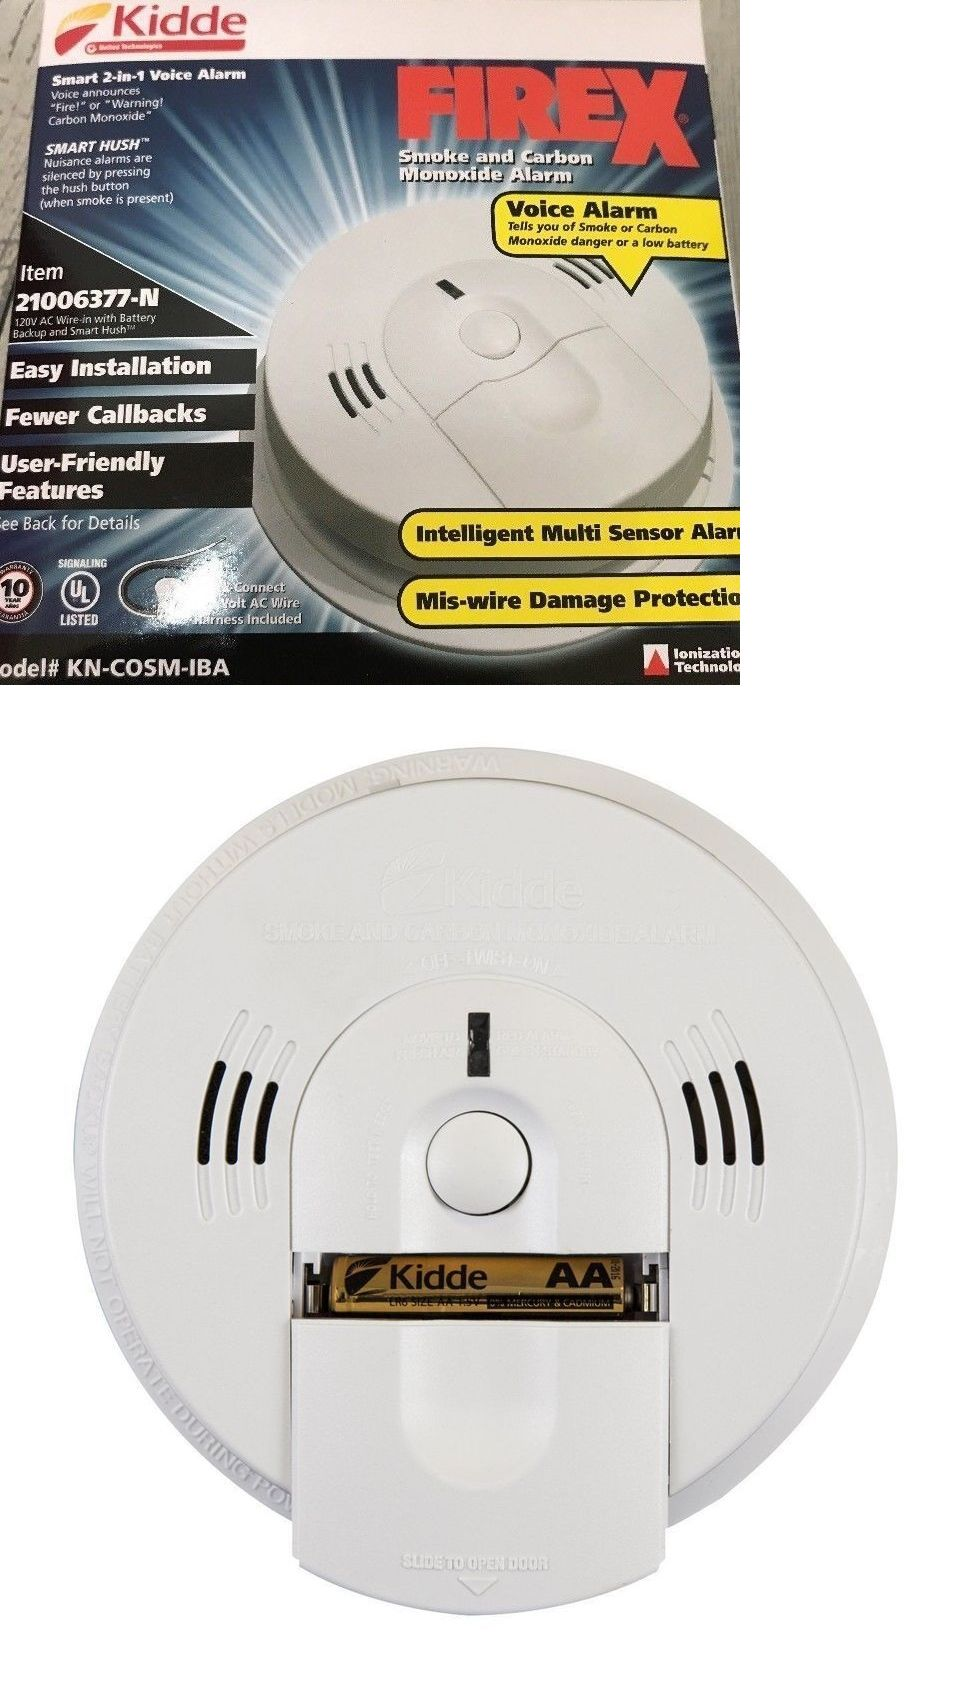 Kidde Kn Cosm Iba Combination Carbon Monoxide Smoke Alarm Brand